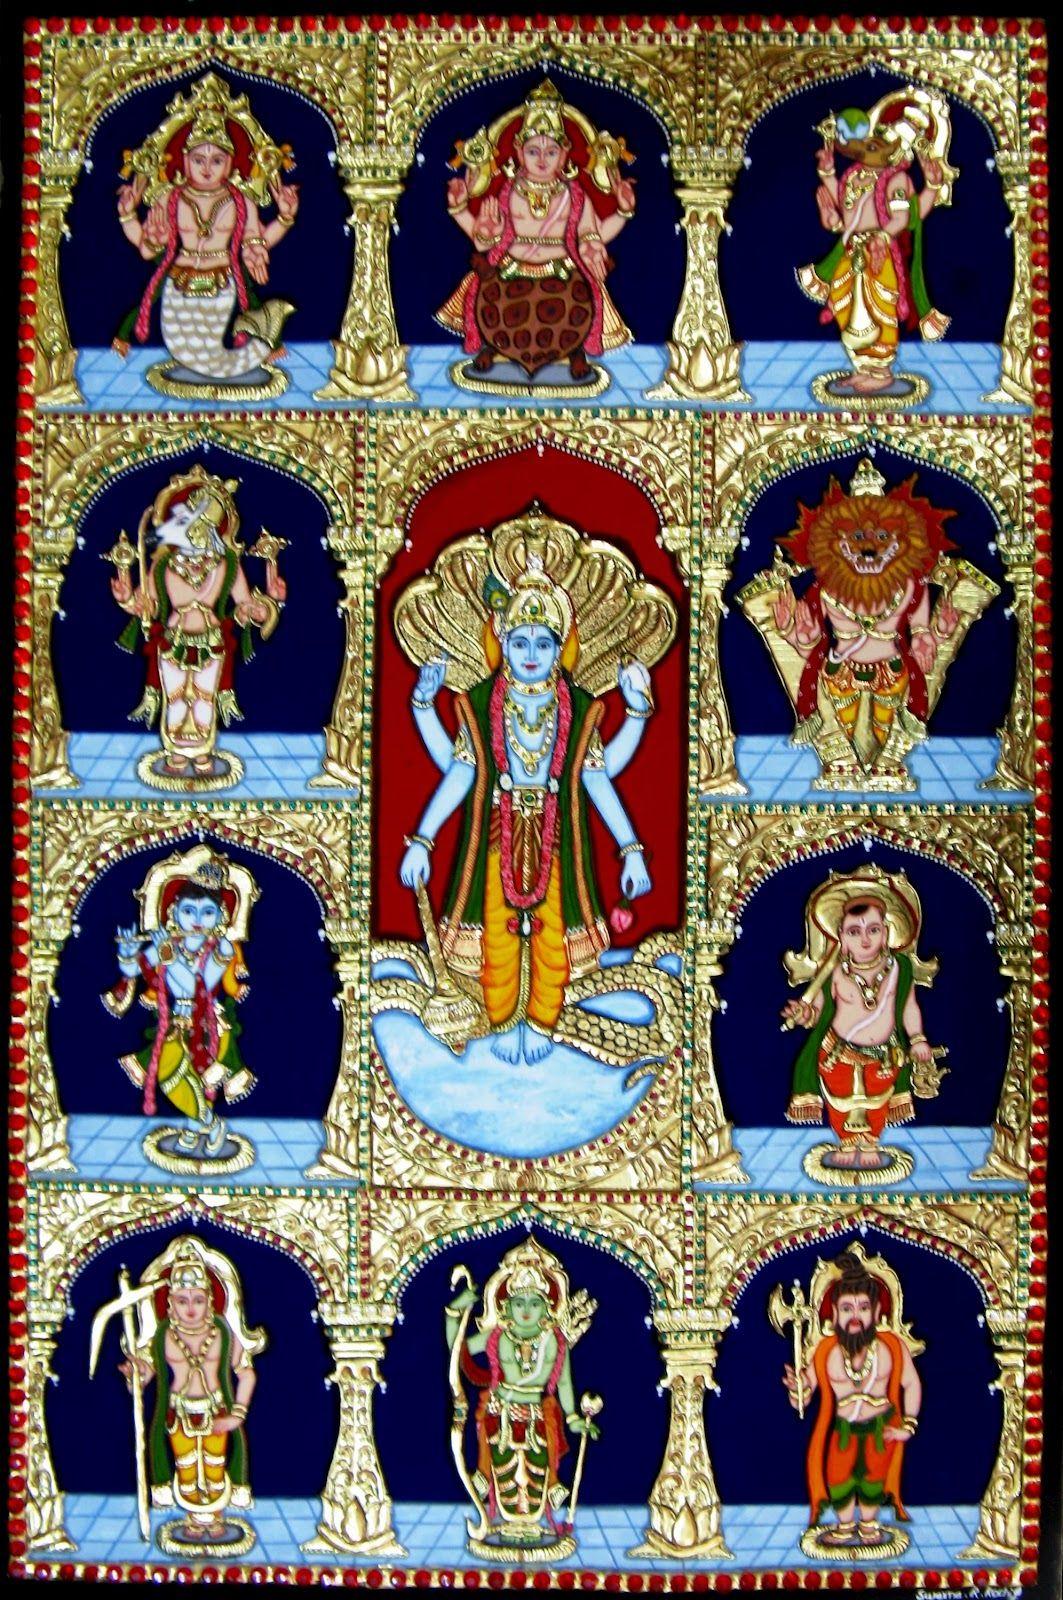 Vedas Resources: Dasavatharam - the 10 incarnations of Lord Vishnu